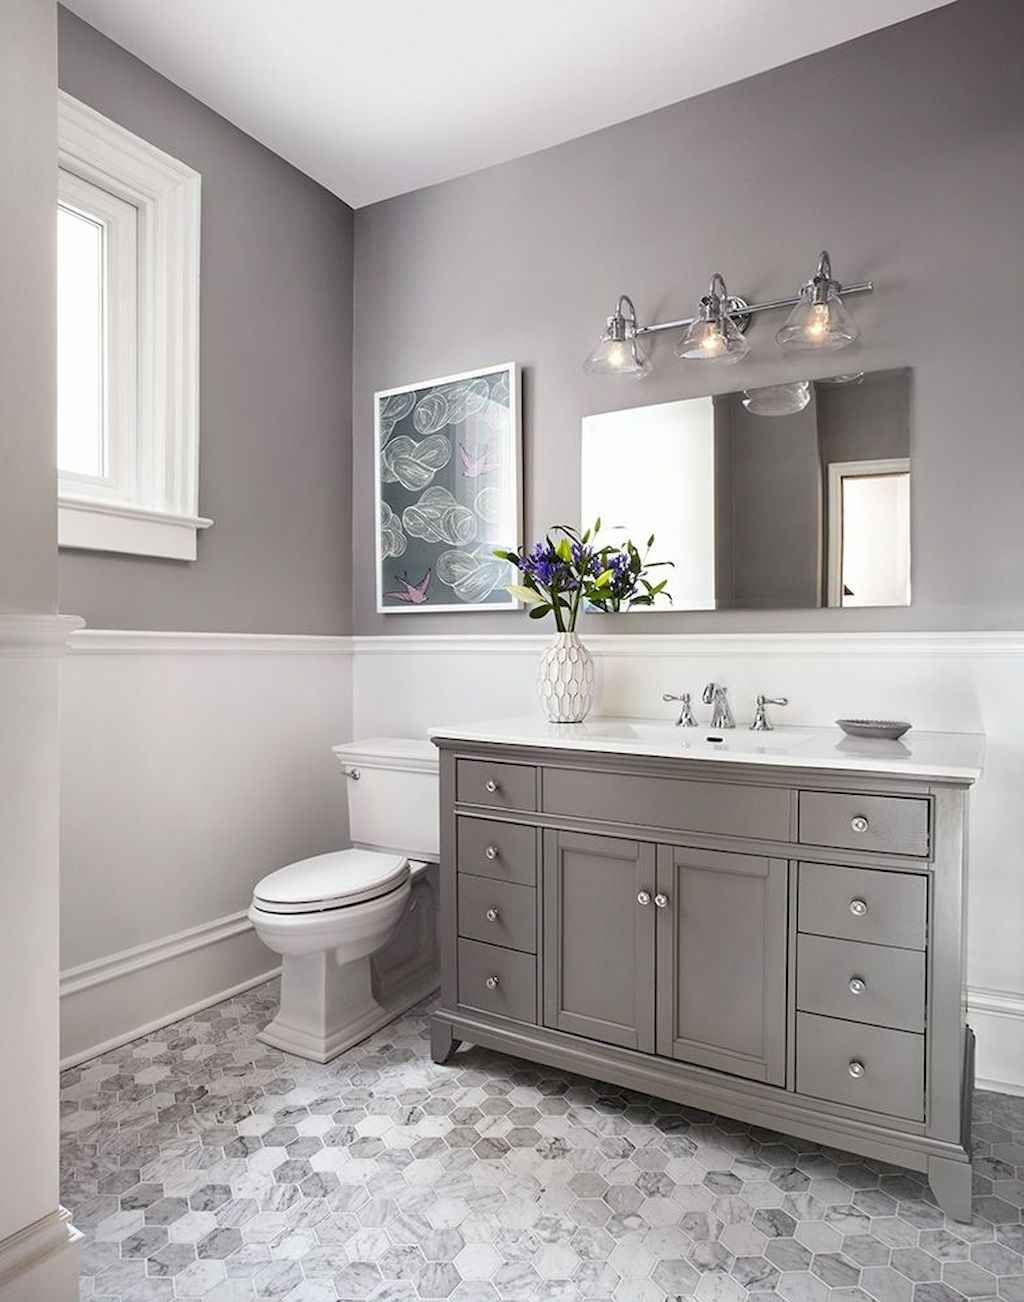 39 Beautiful Shabby Chic Bedroom Decorating Ideas In 2020 Small Bathroom Amazing Bathrooms